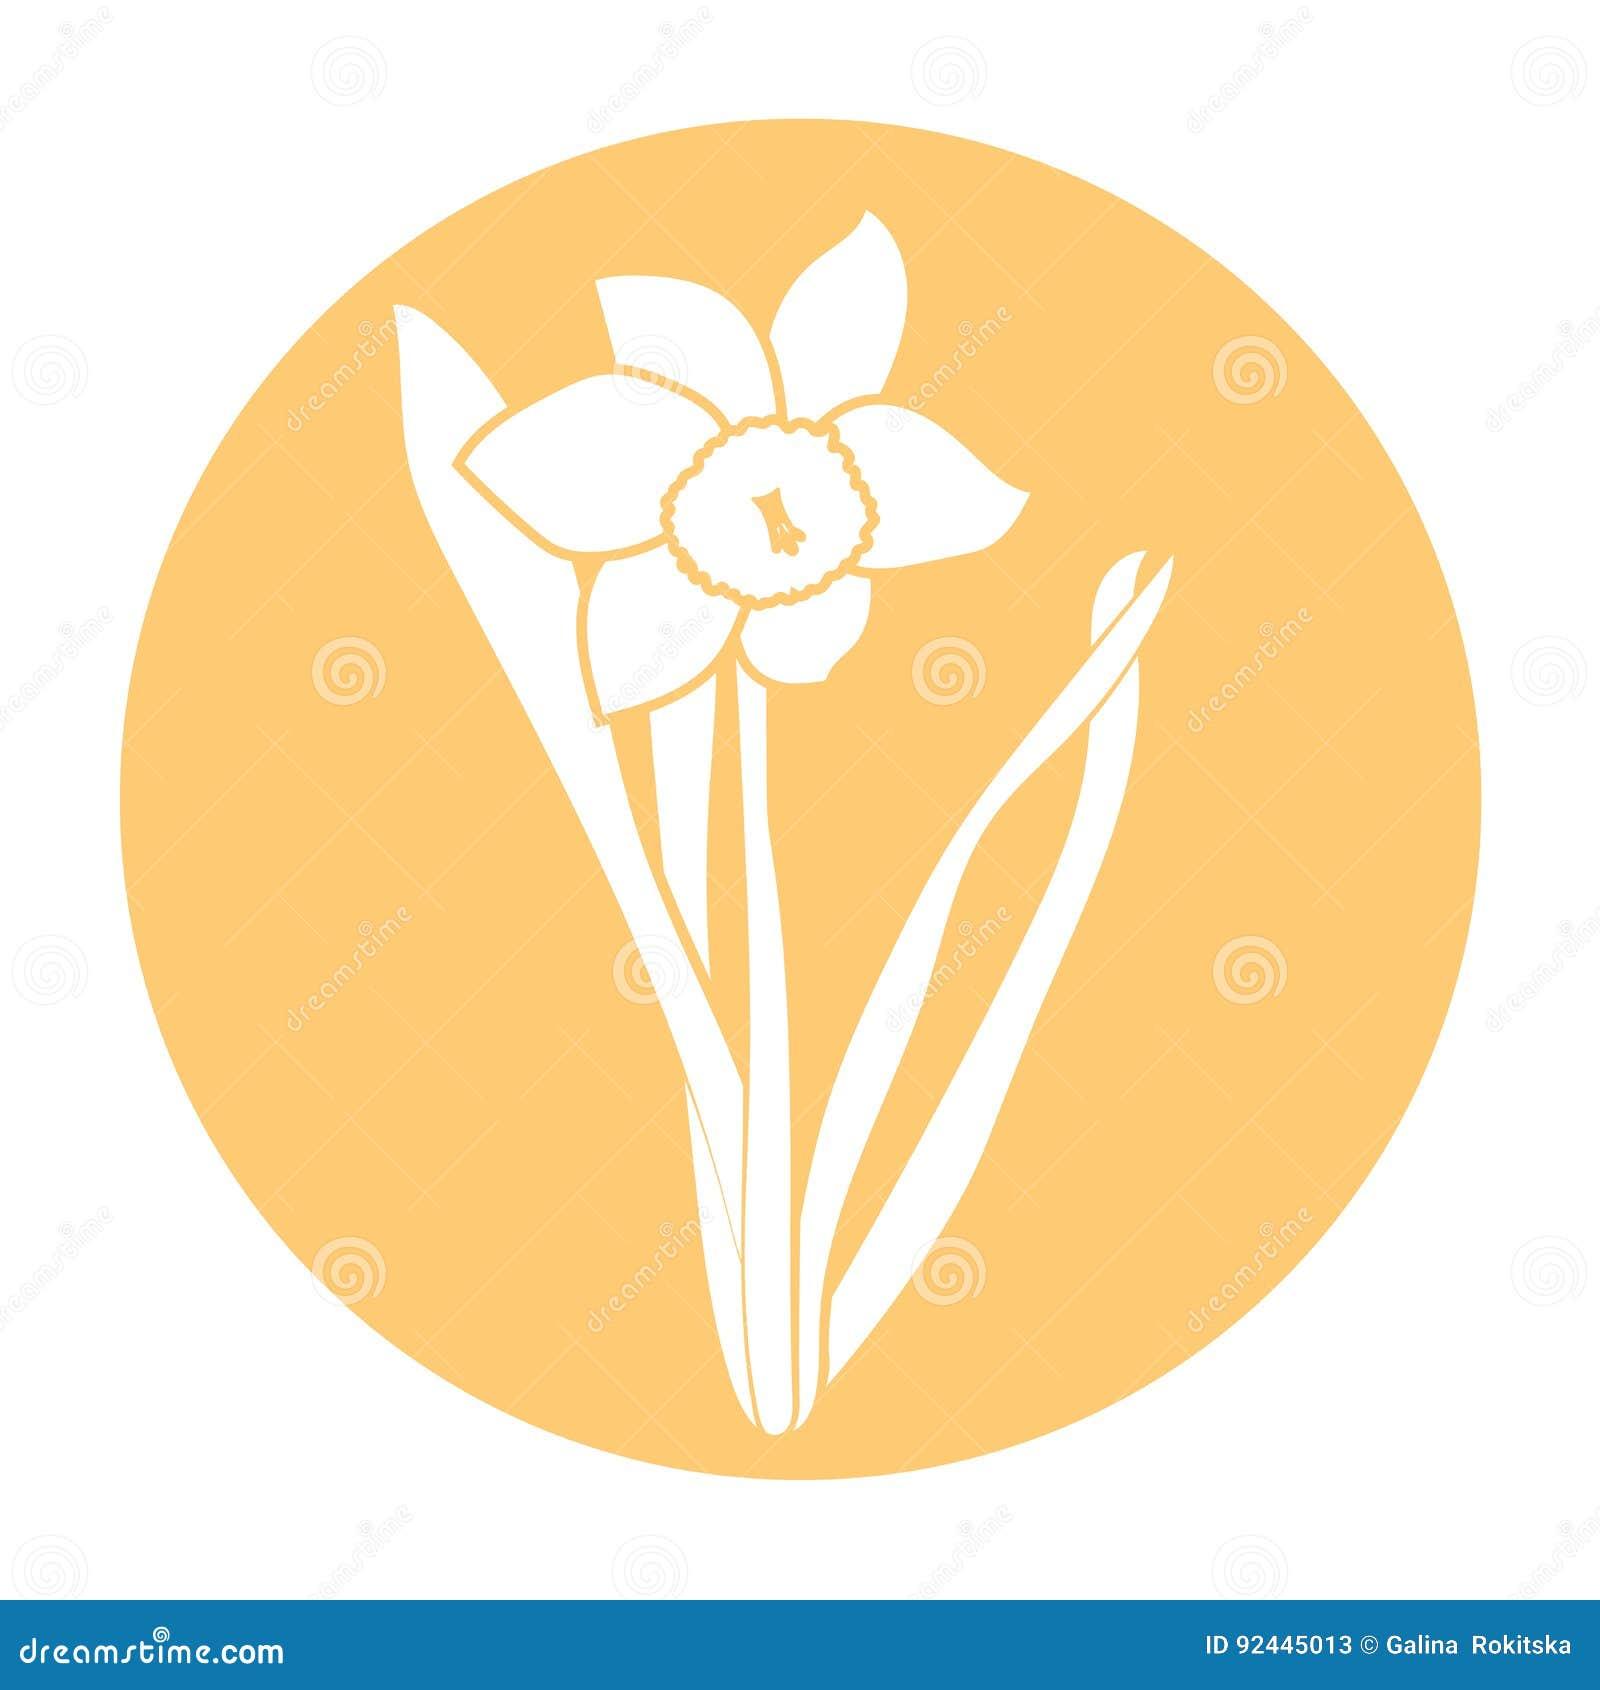 vit lilja symbol